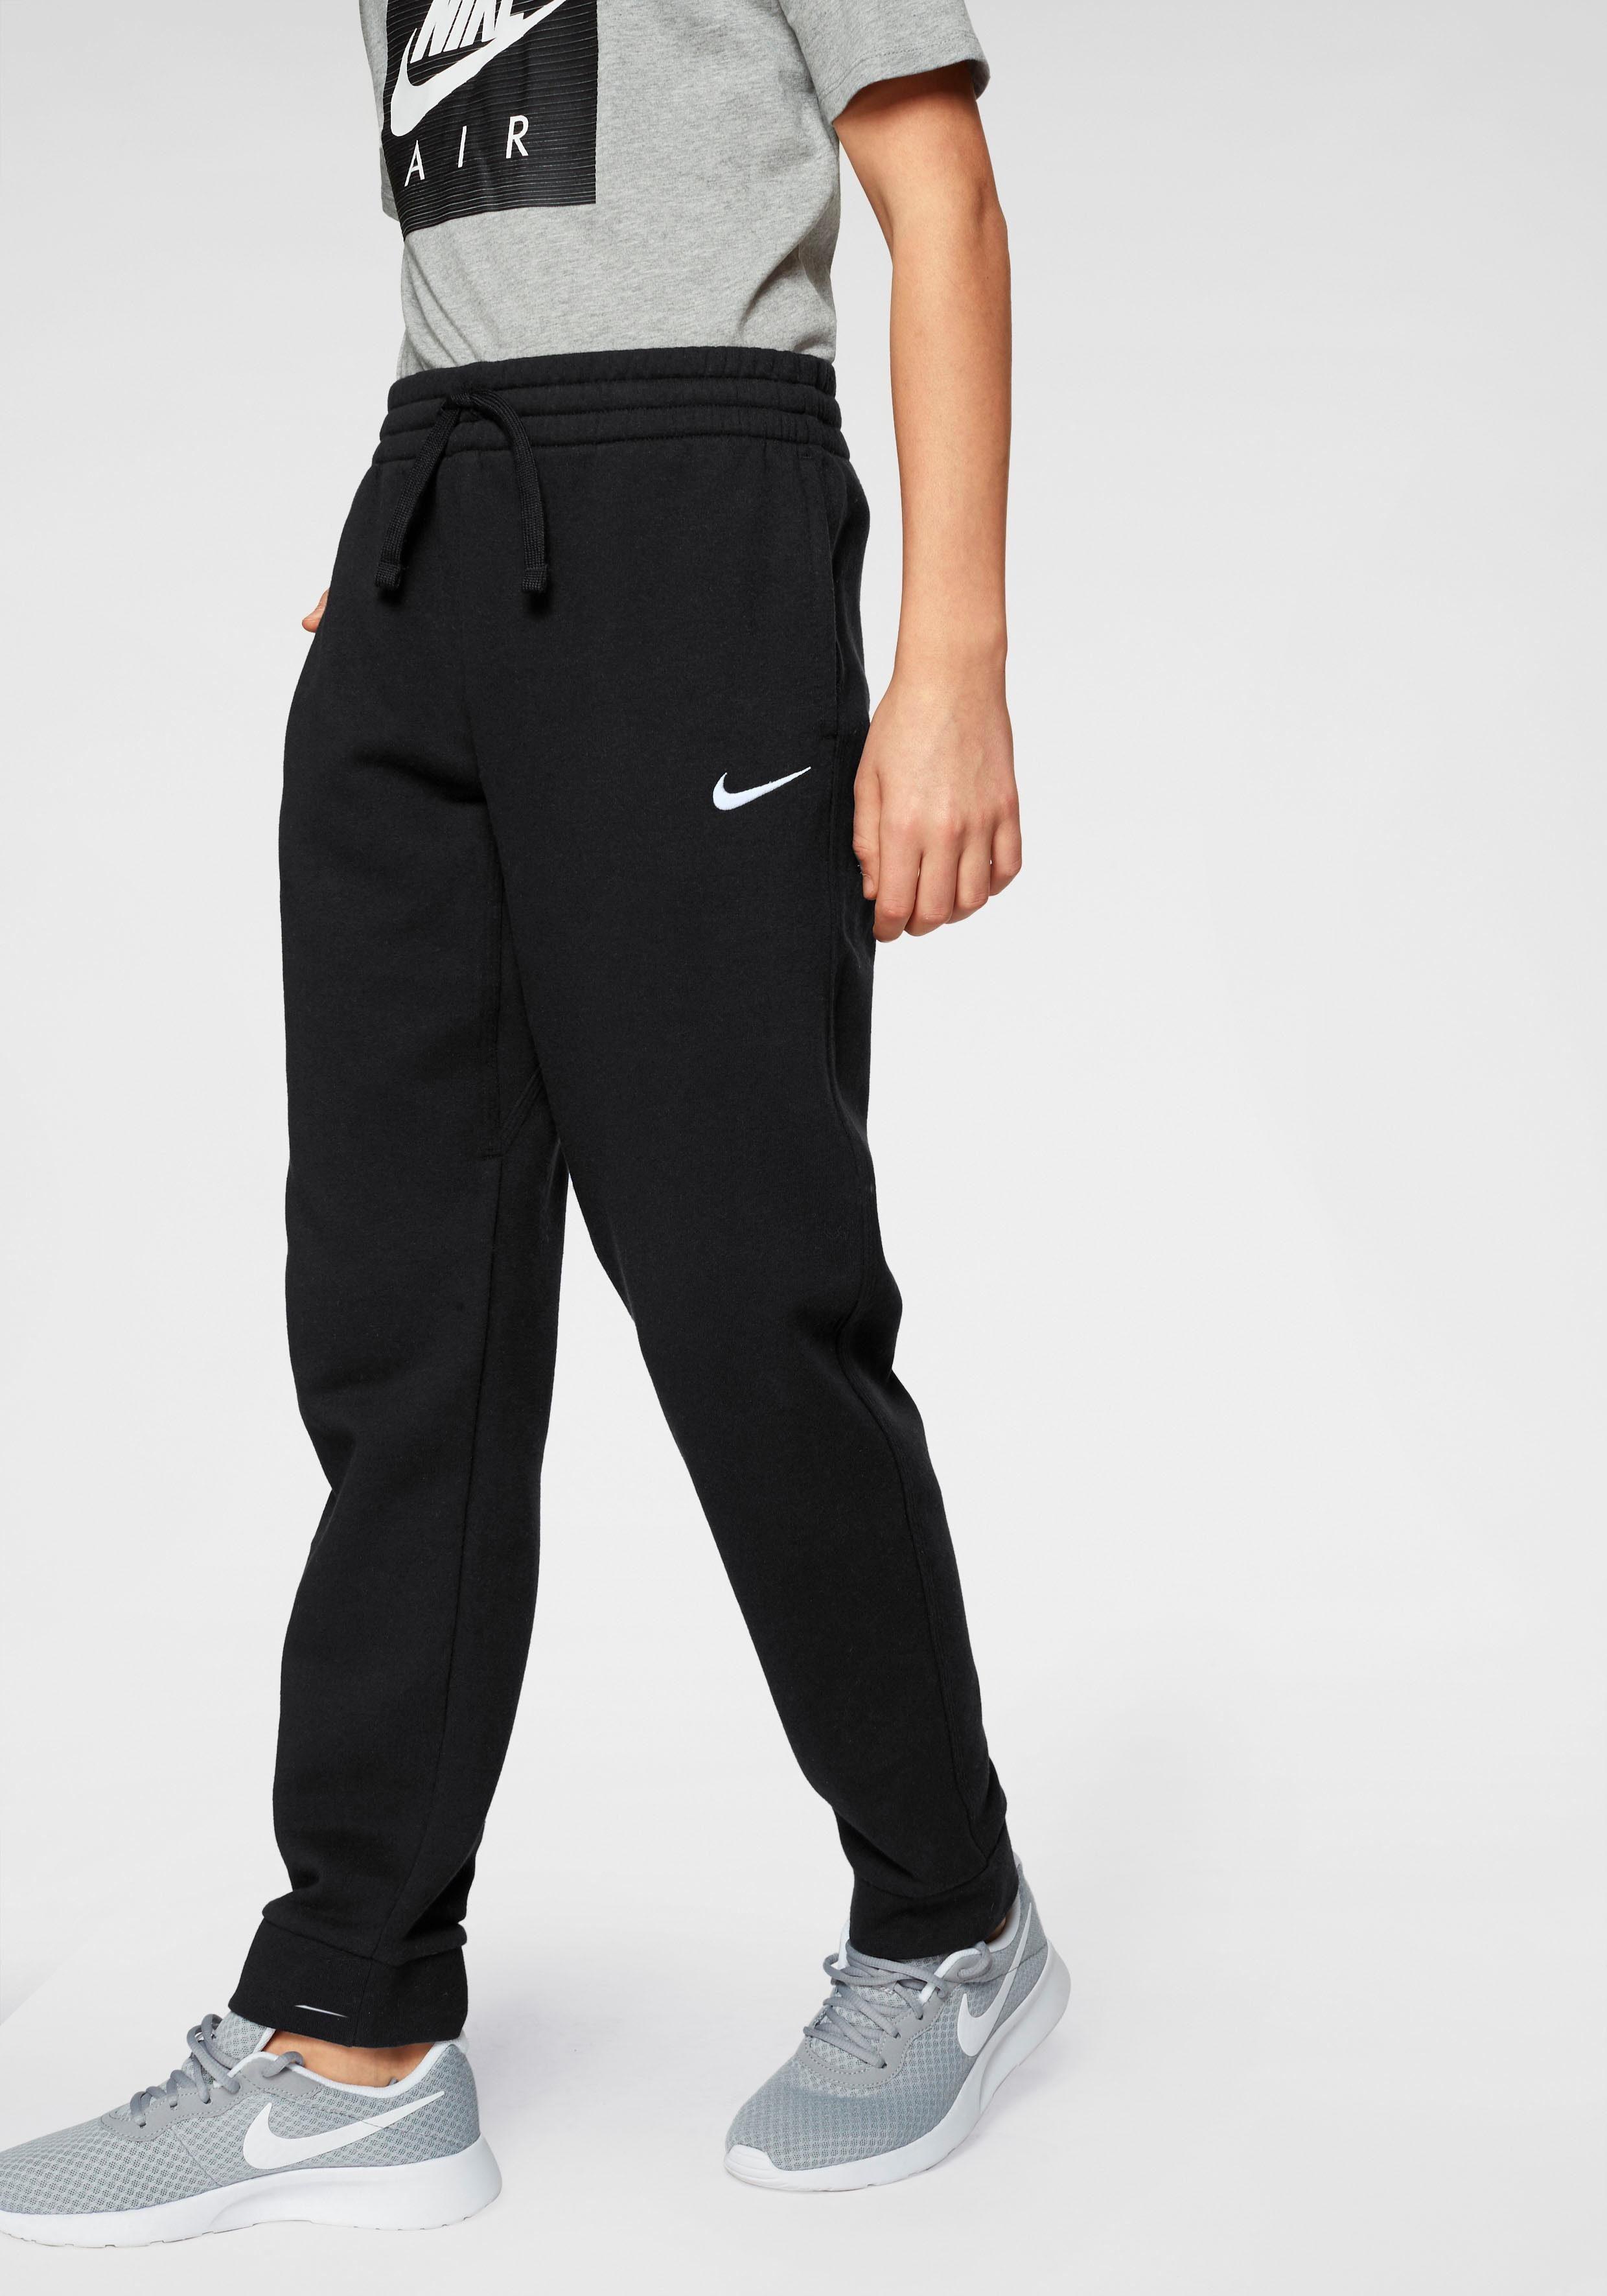 Nike Sportswear Jogginghose »BOYS NIKE PANT N45 CORE BRIEF JOGGER« online kaufen | OTTO